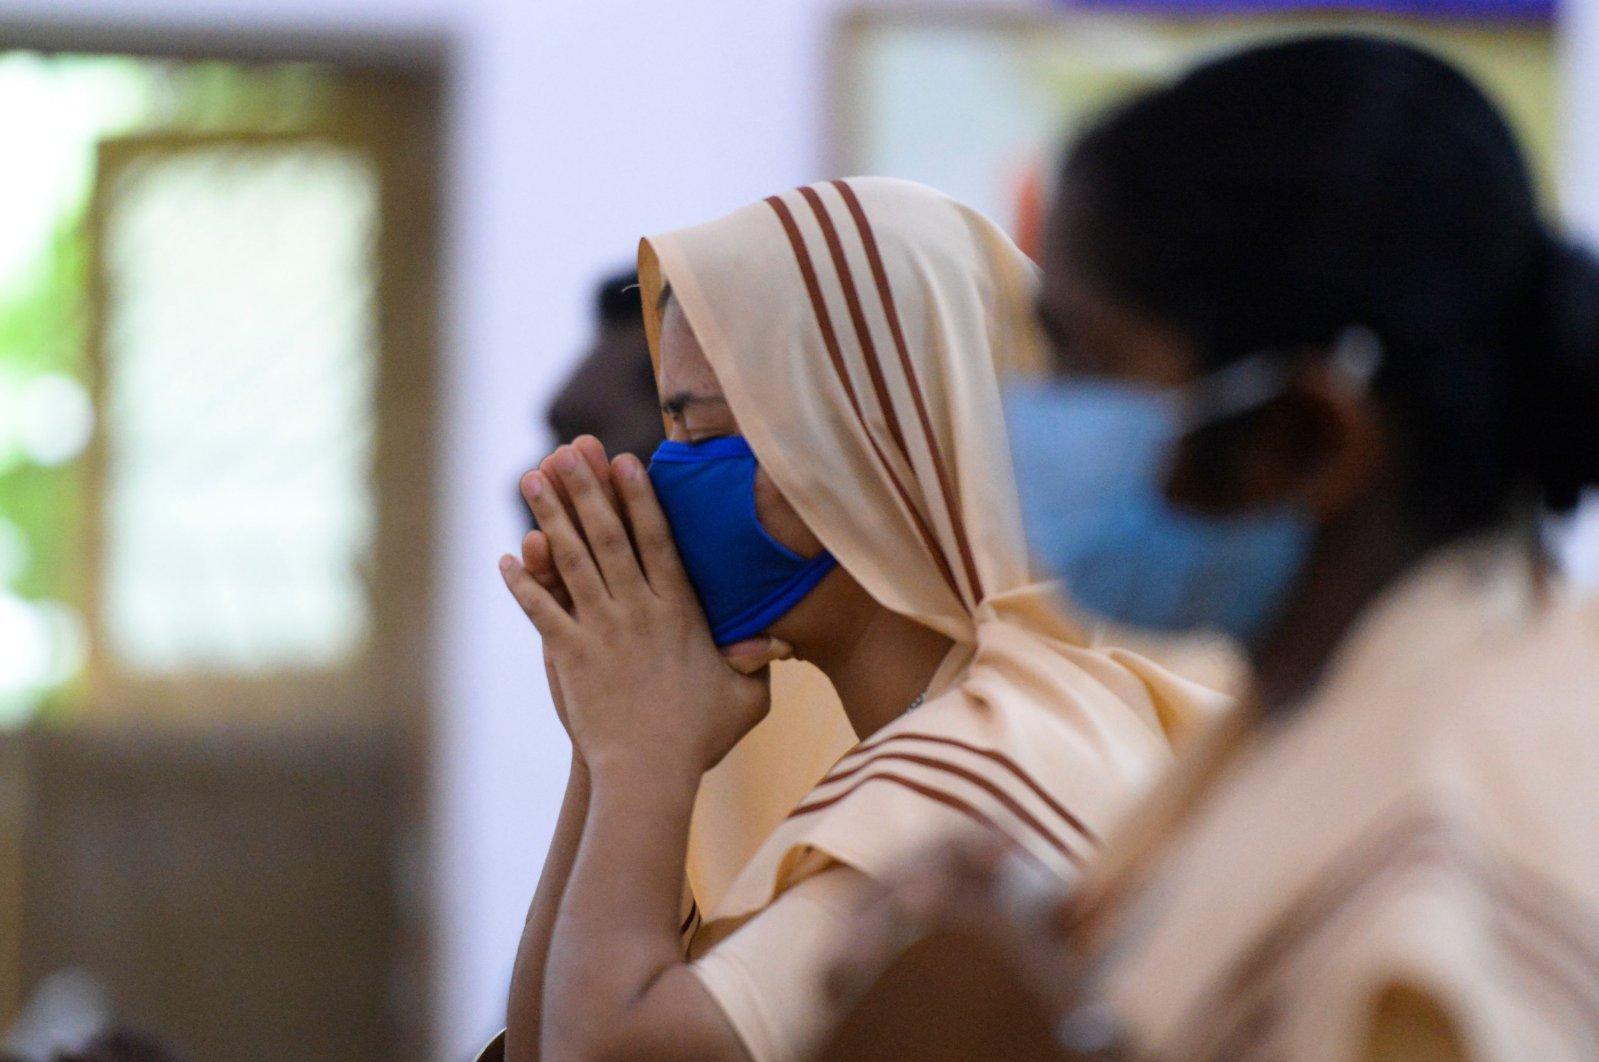 A Catholic nun wearing a face mask attends a Mass service at Saint Joseph's Church, Hyderabad, India, June 8, 2020. (AFP Photo)